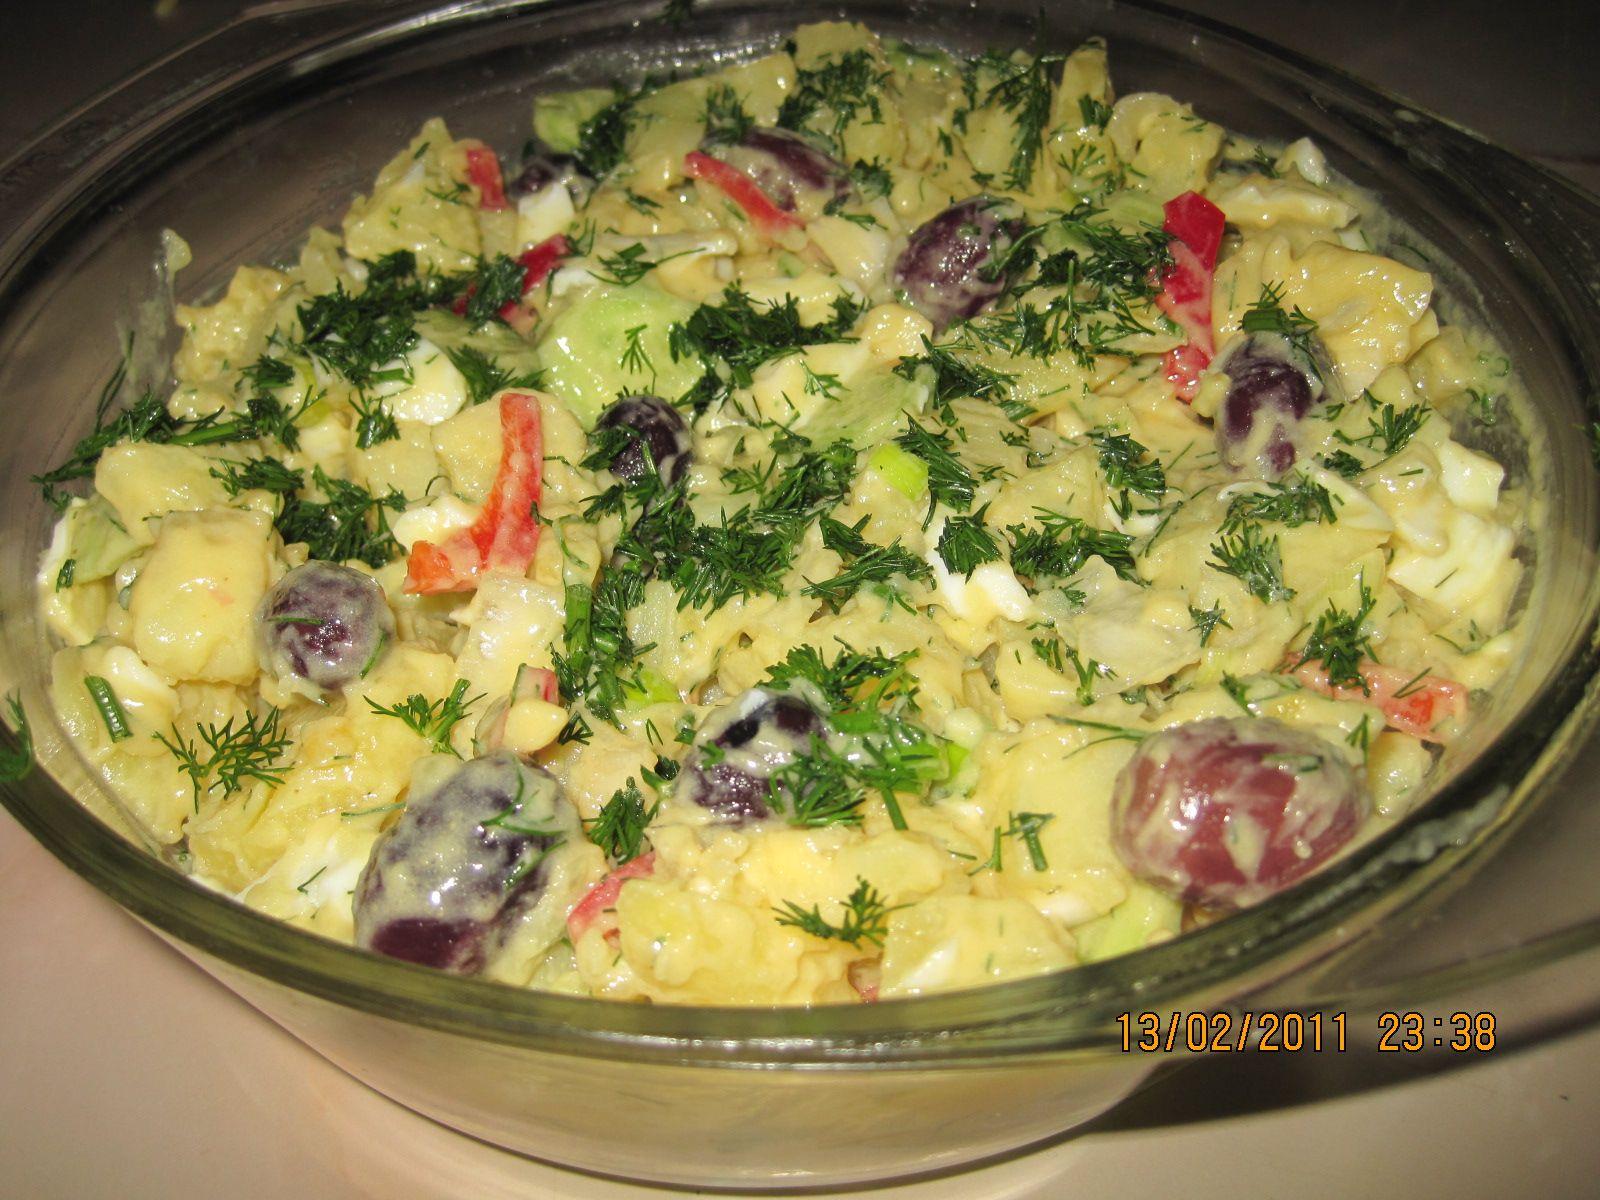 Reteta culinara salata orientala din categoria salate specific fun food reteta culinara salata orientala din categoria salate specific romania cum sa faci salata orientala forumfinder Image collections